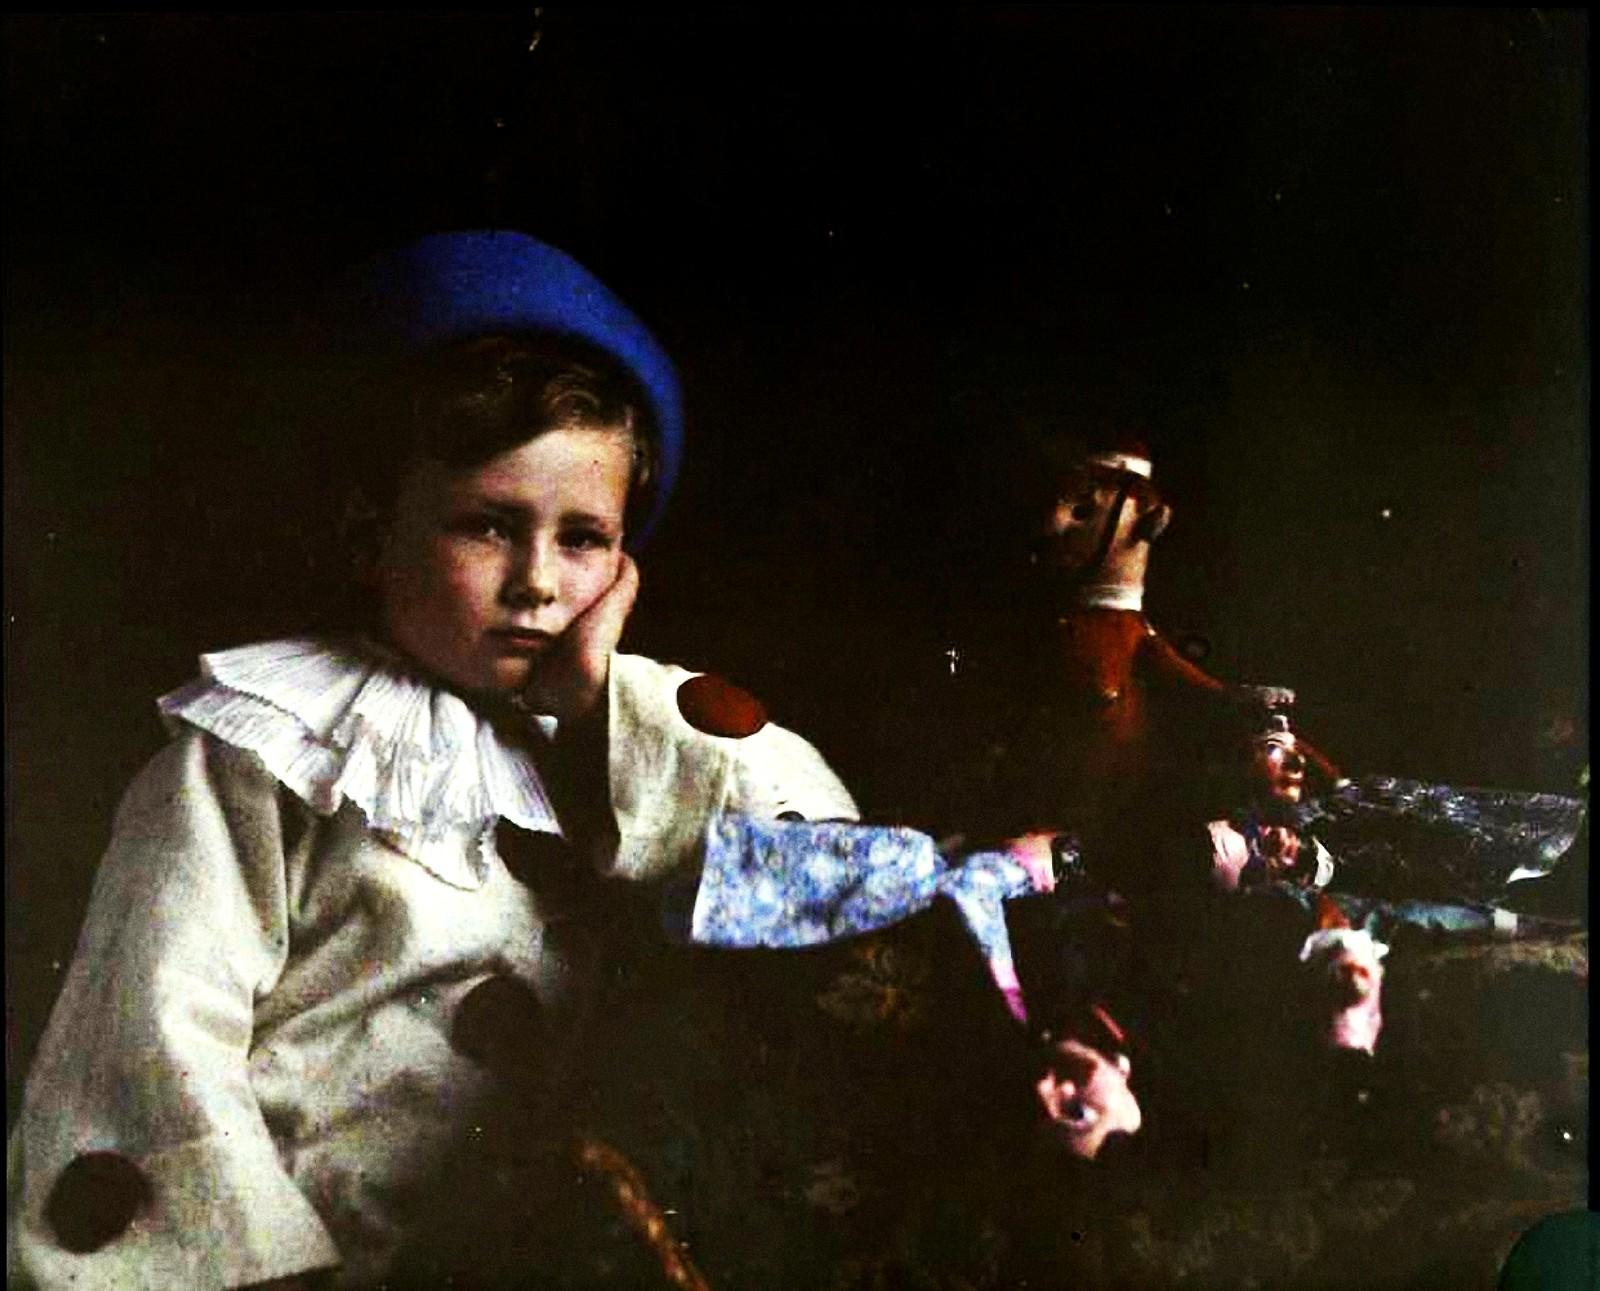 1909. Пьер Гейн в костюме Пьеро, с куклами